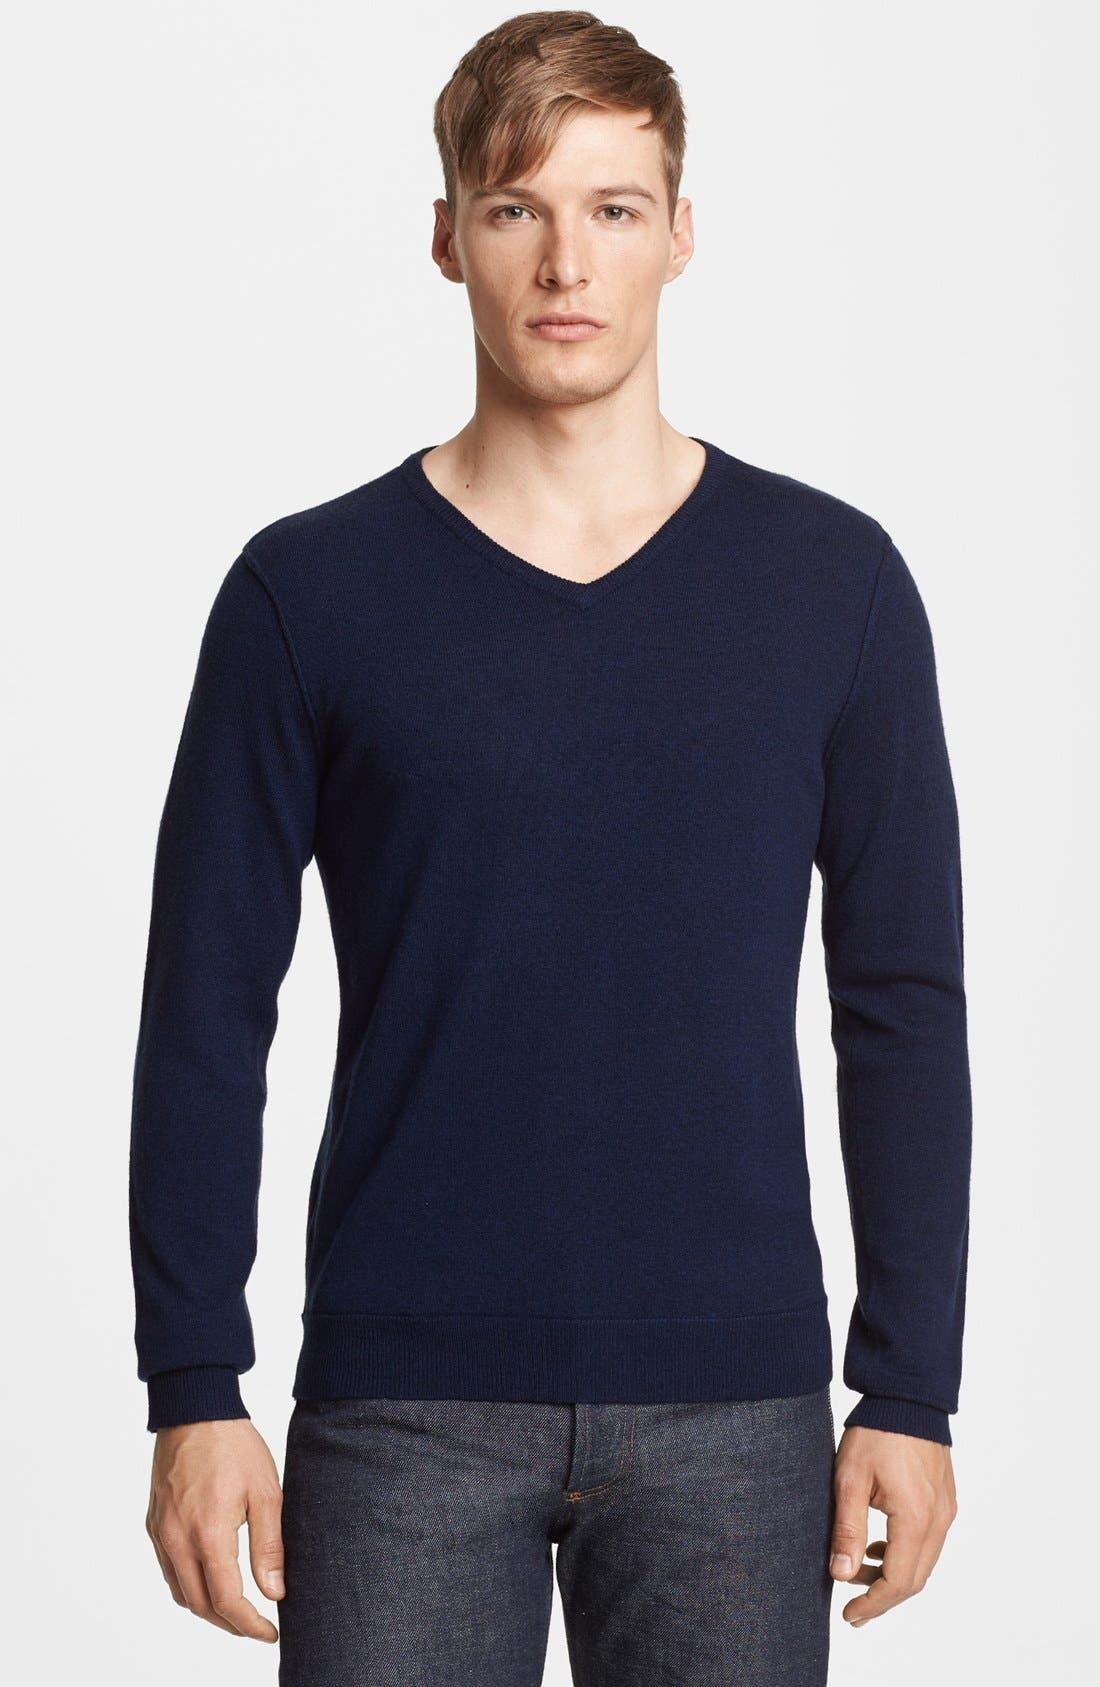 Alternate Image 1 Selected - rag & bone 'Abingdon' V-Neck Merino Wool Sweater